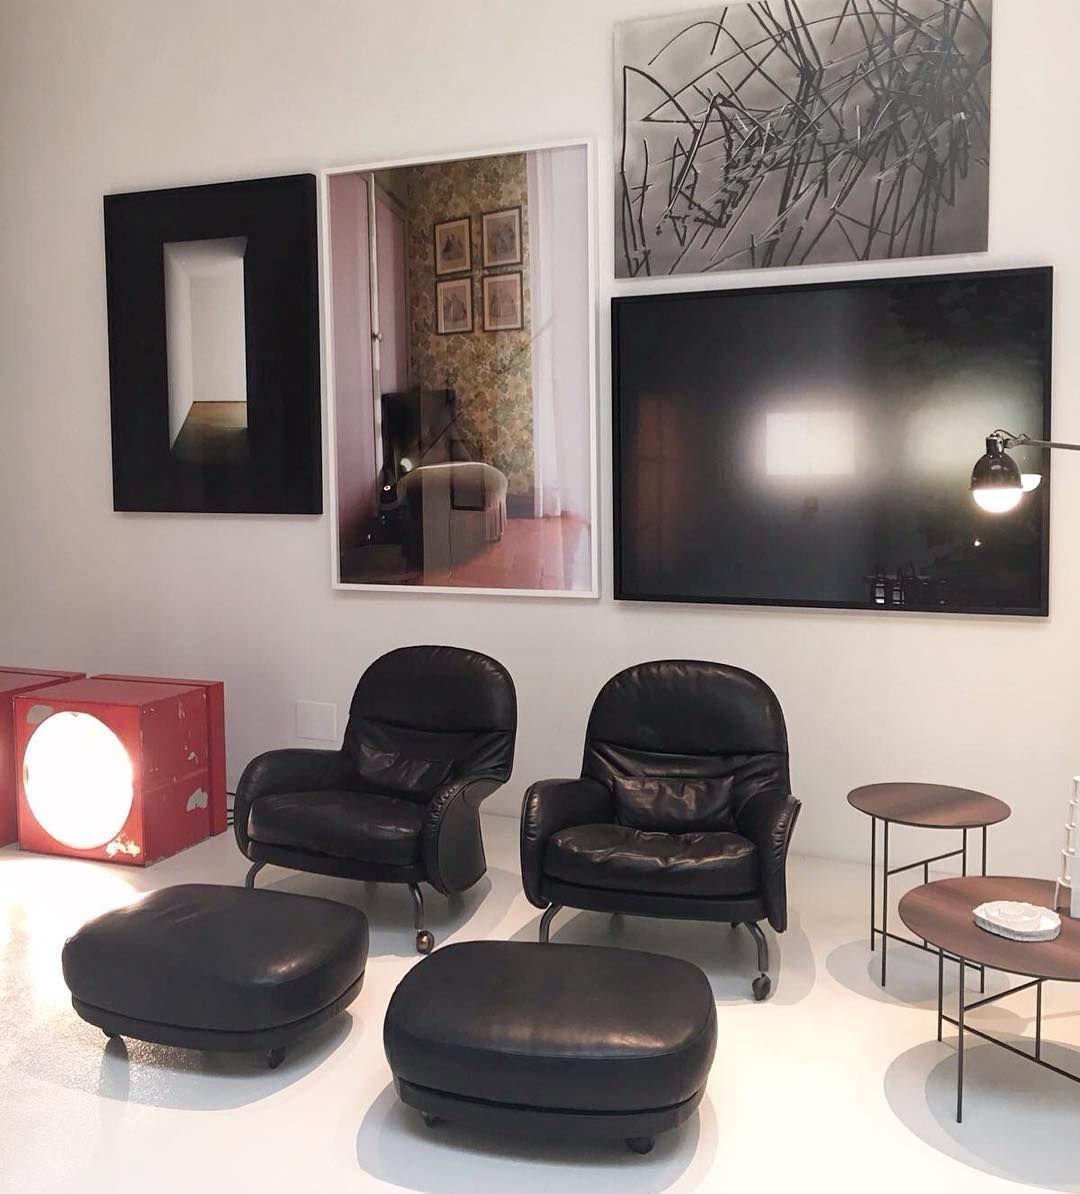 Latergram of De Padova @isaloniofficial #design #interior #interiordesign #depadova #isaloni2016 #milano #milan #furnituredesign by clic_hamburg